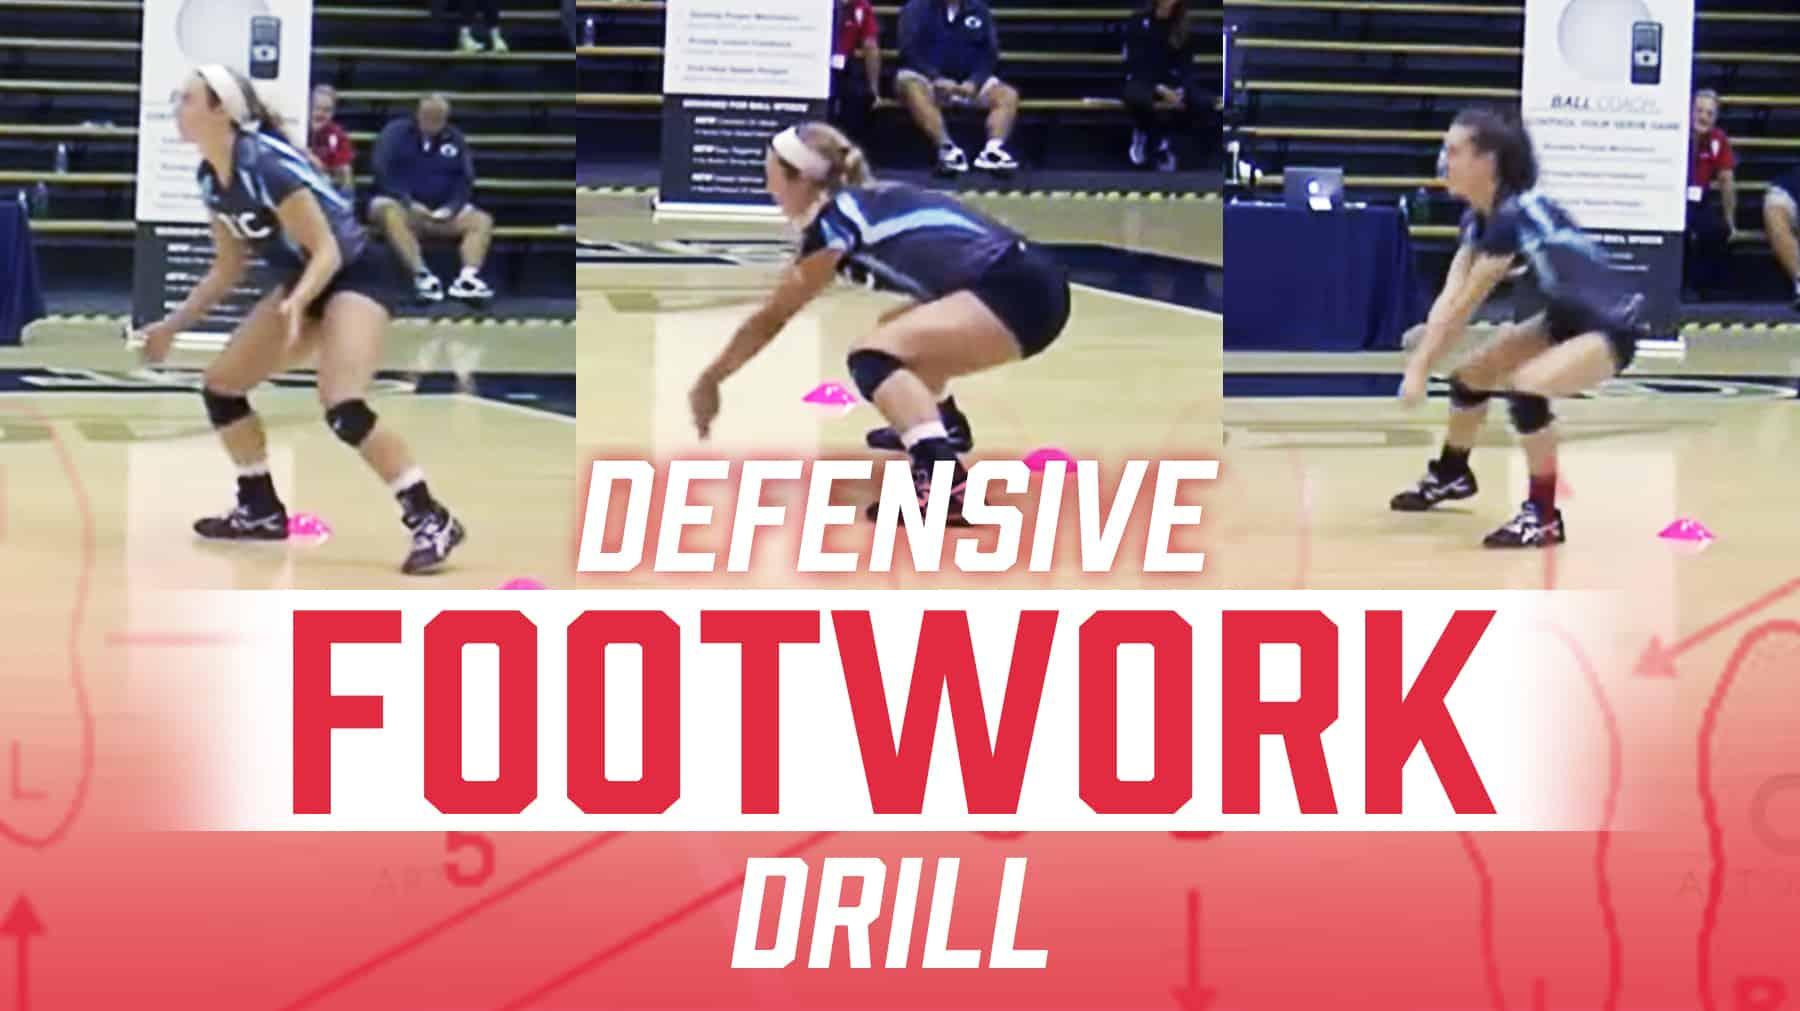 Defensive Footwork Drill With Joe Sagula